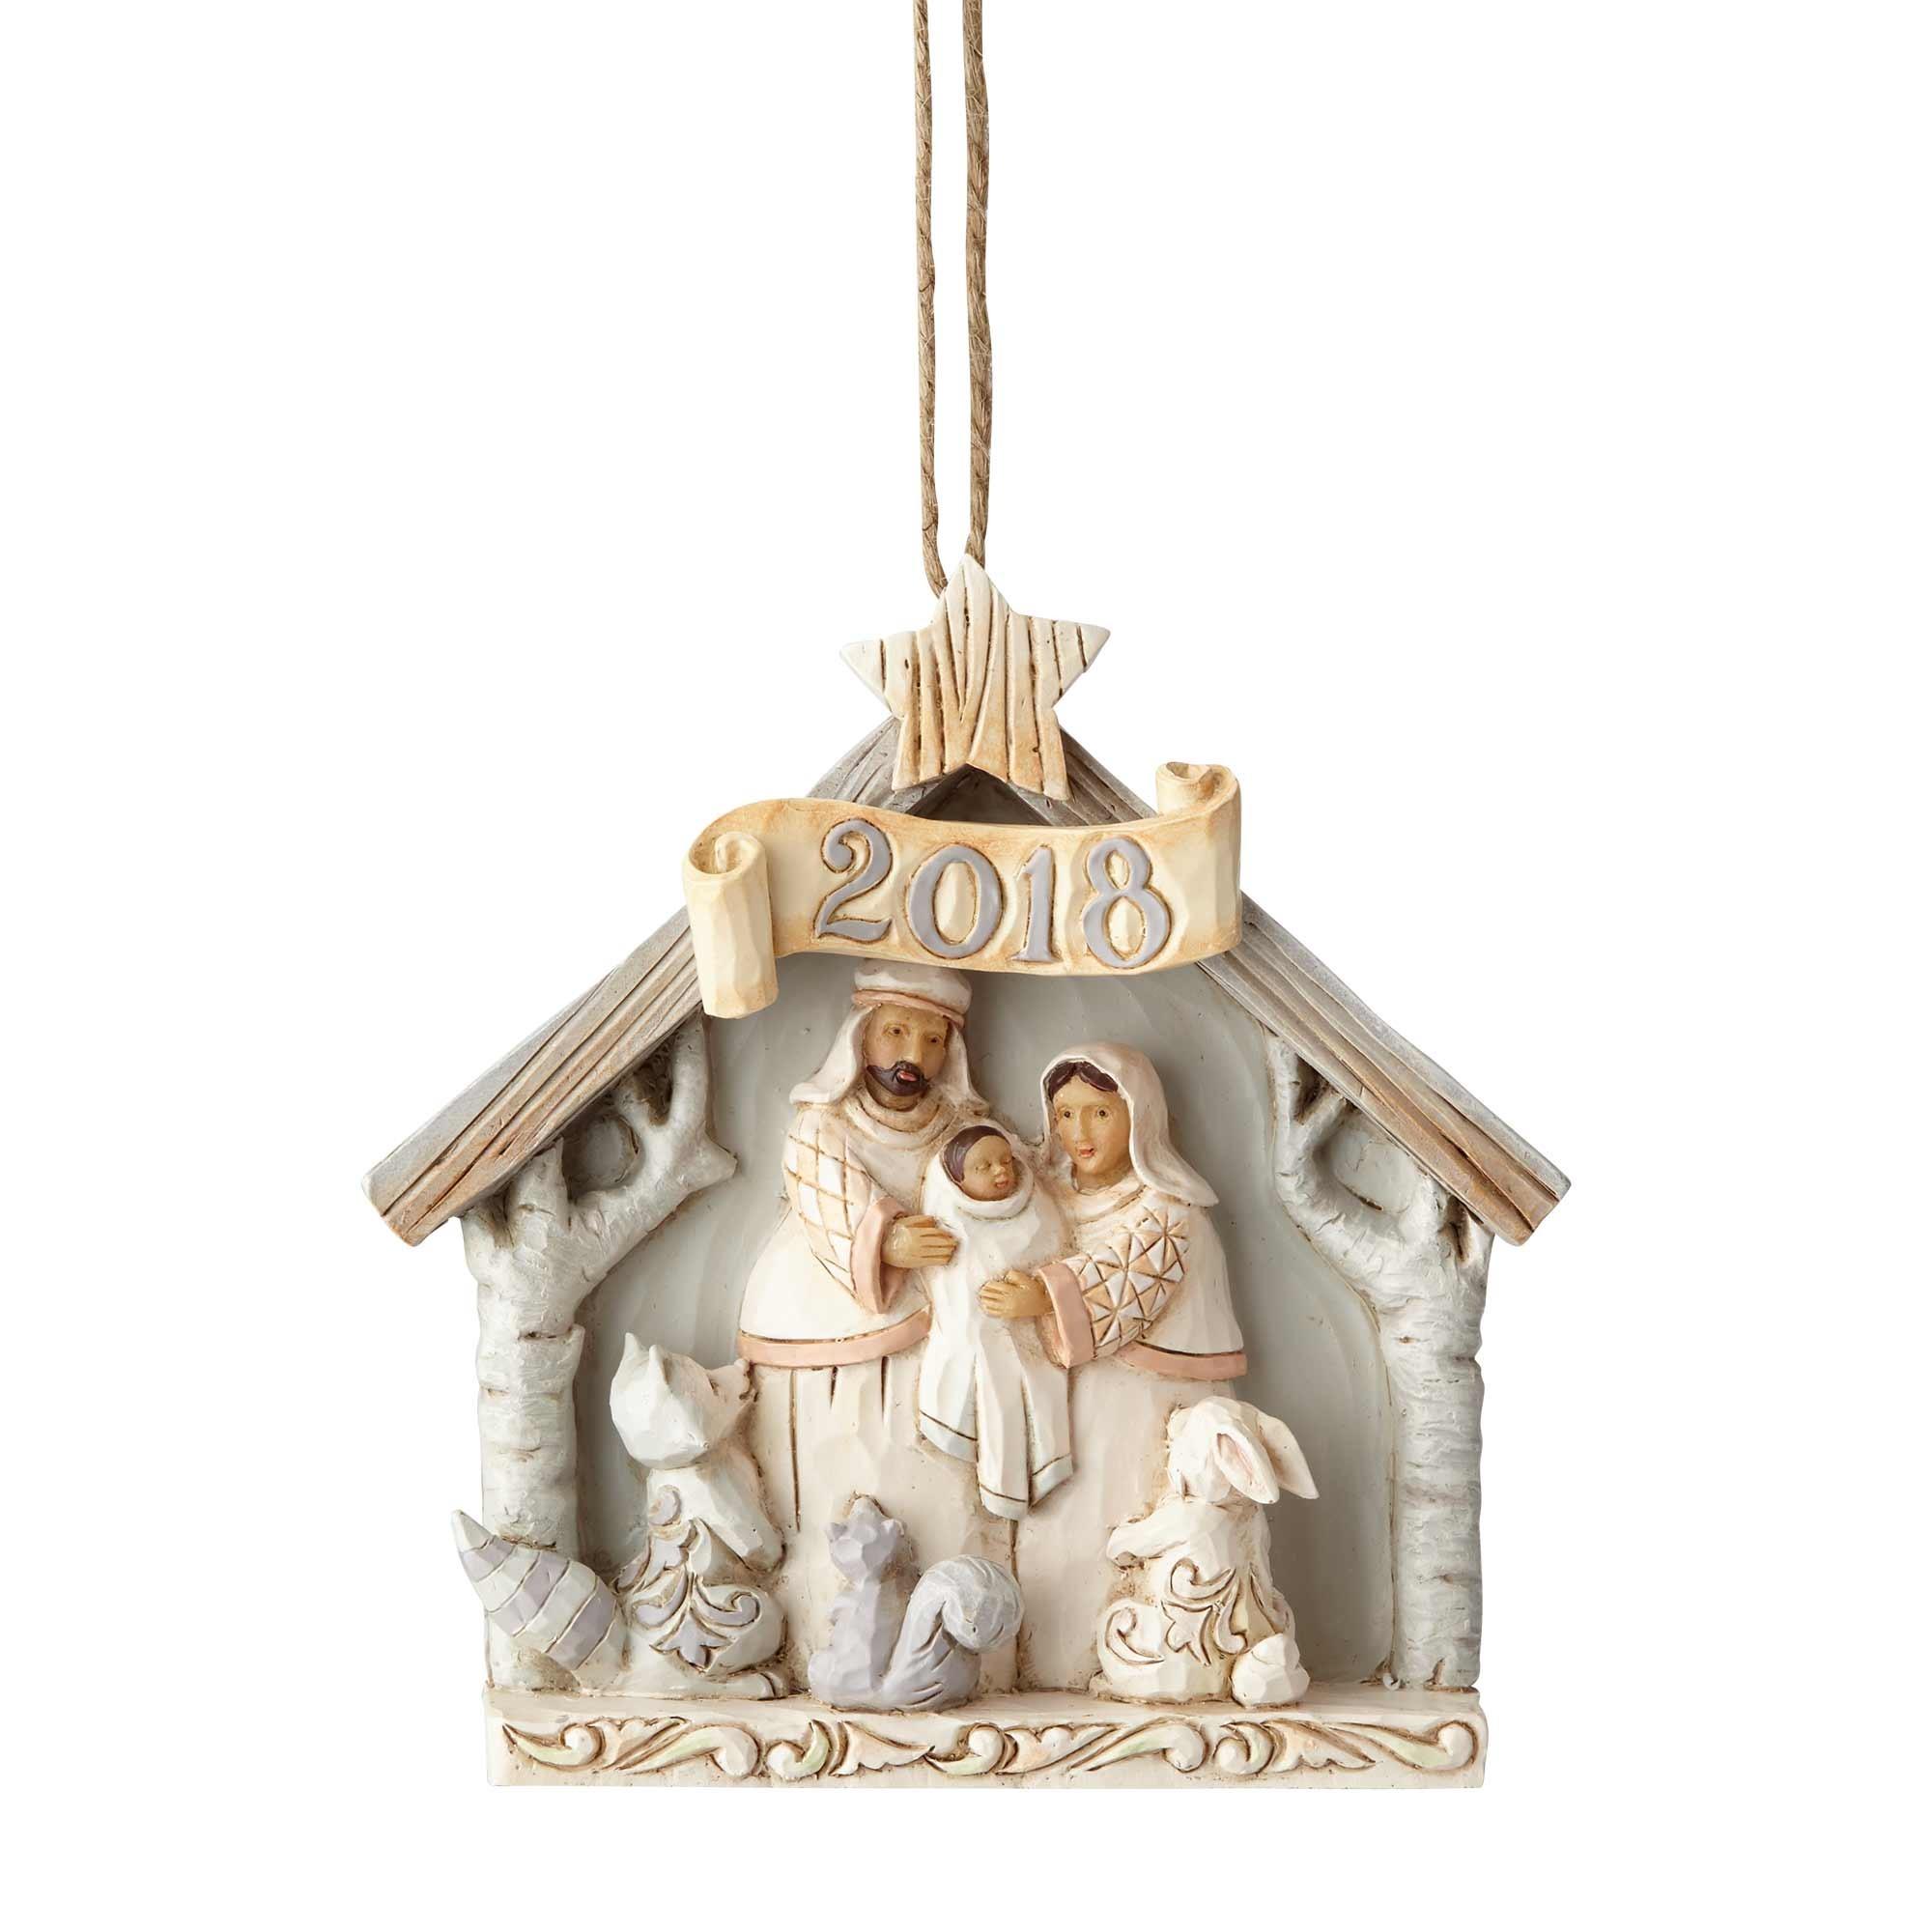 Jim Shore Heartwood Creek 6001417 White Woodland 2018 Nativity Ornament